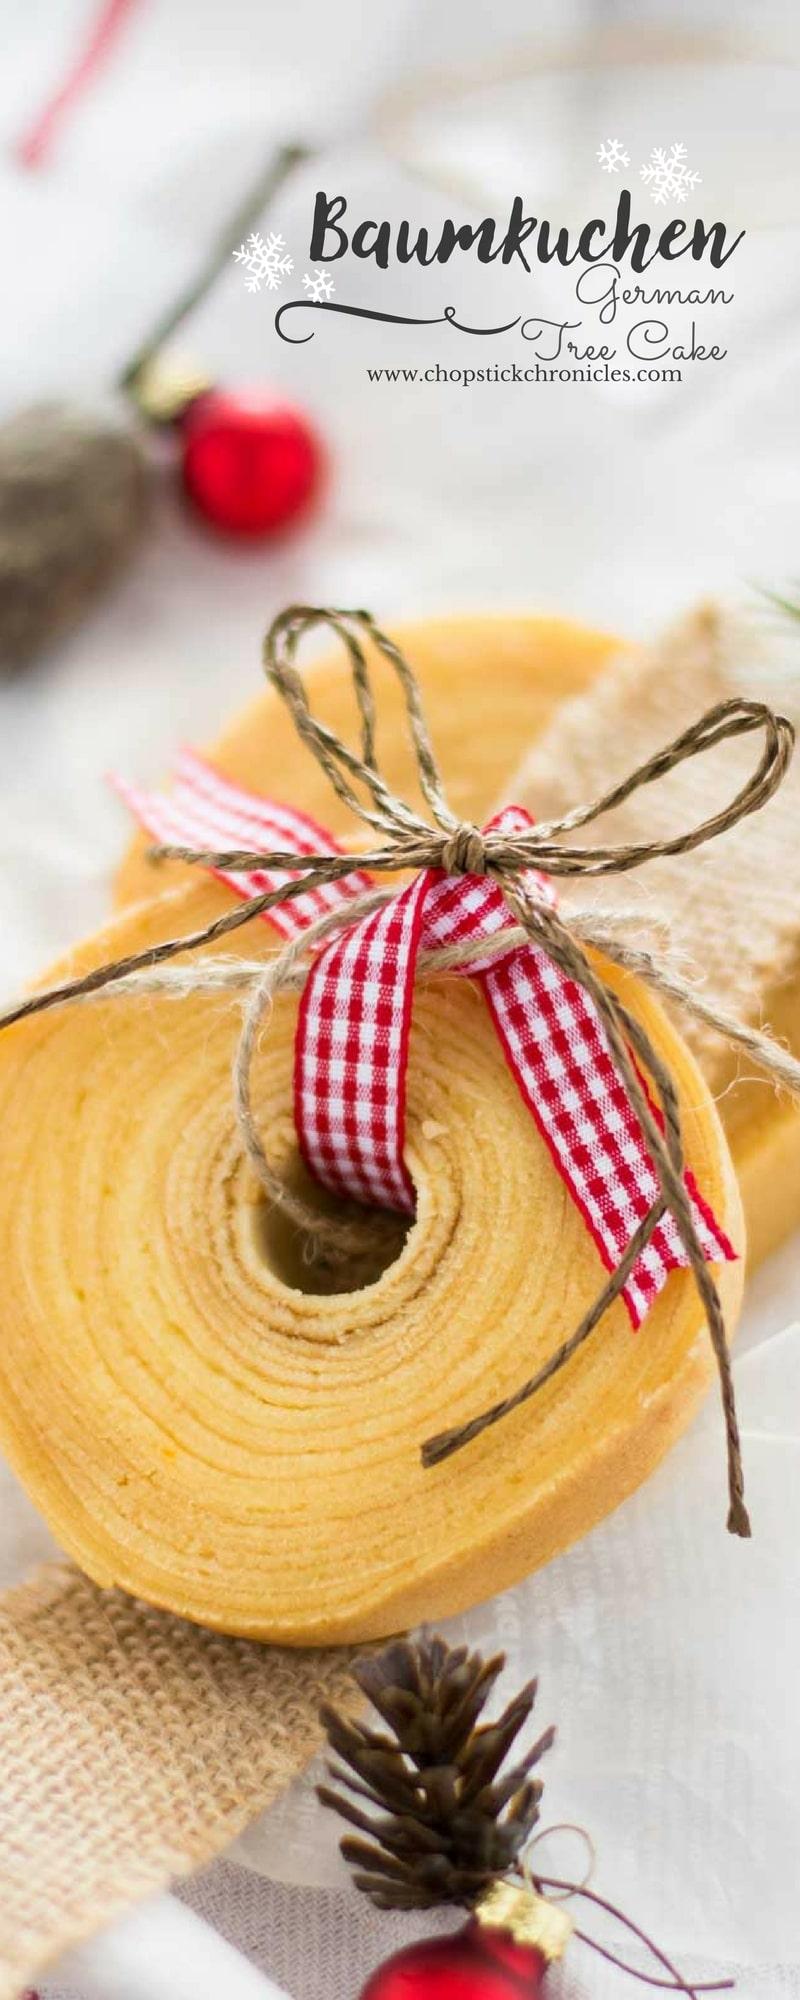 german-tree-cake-baumkuchen